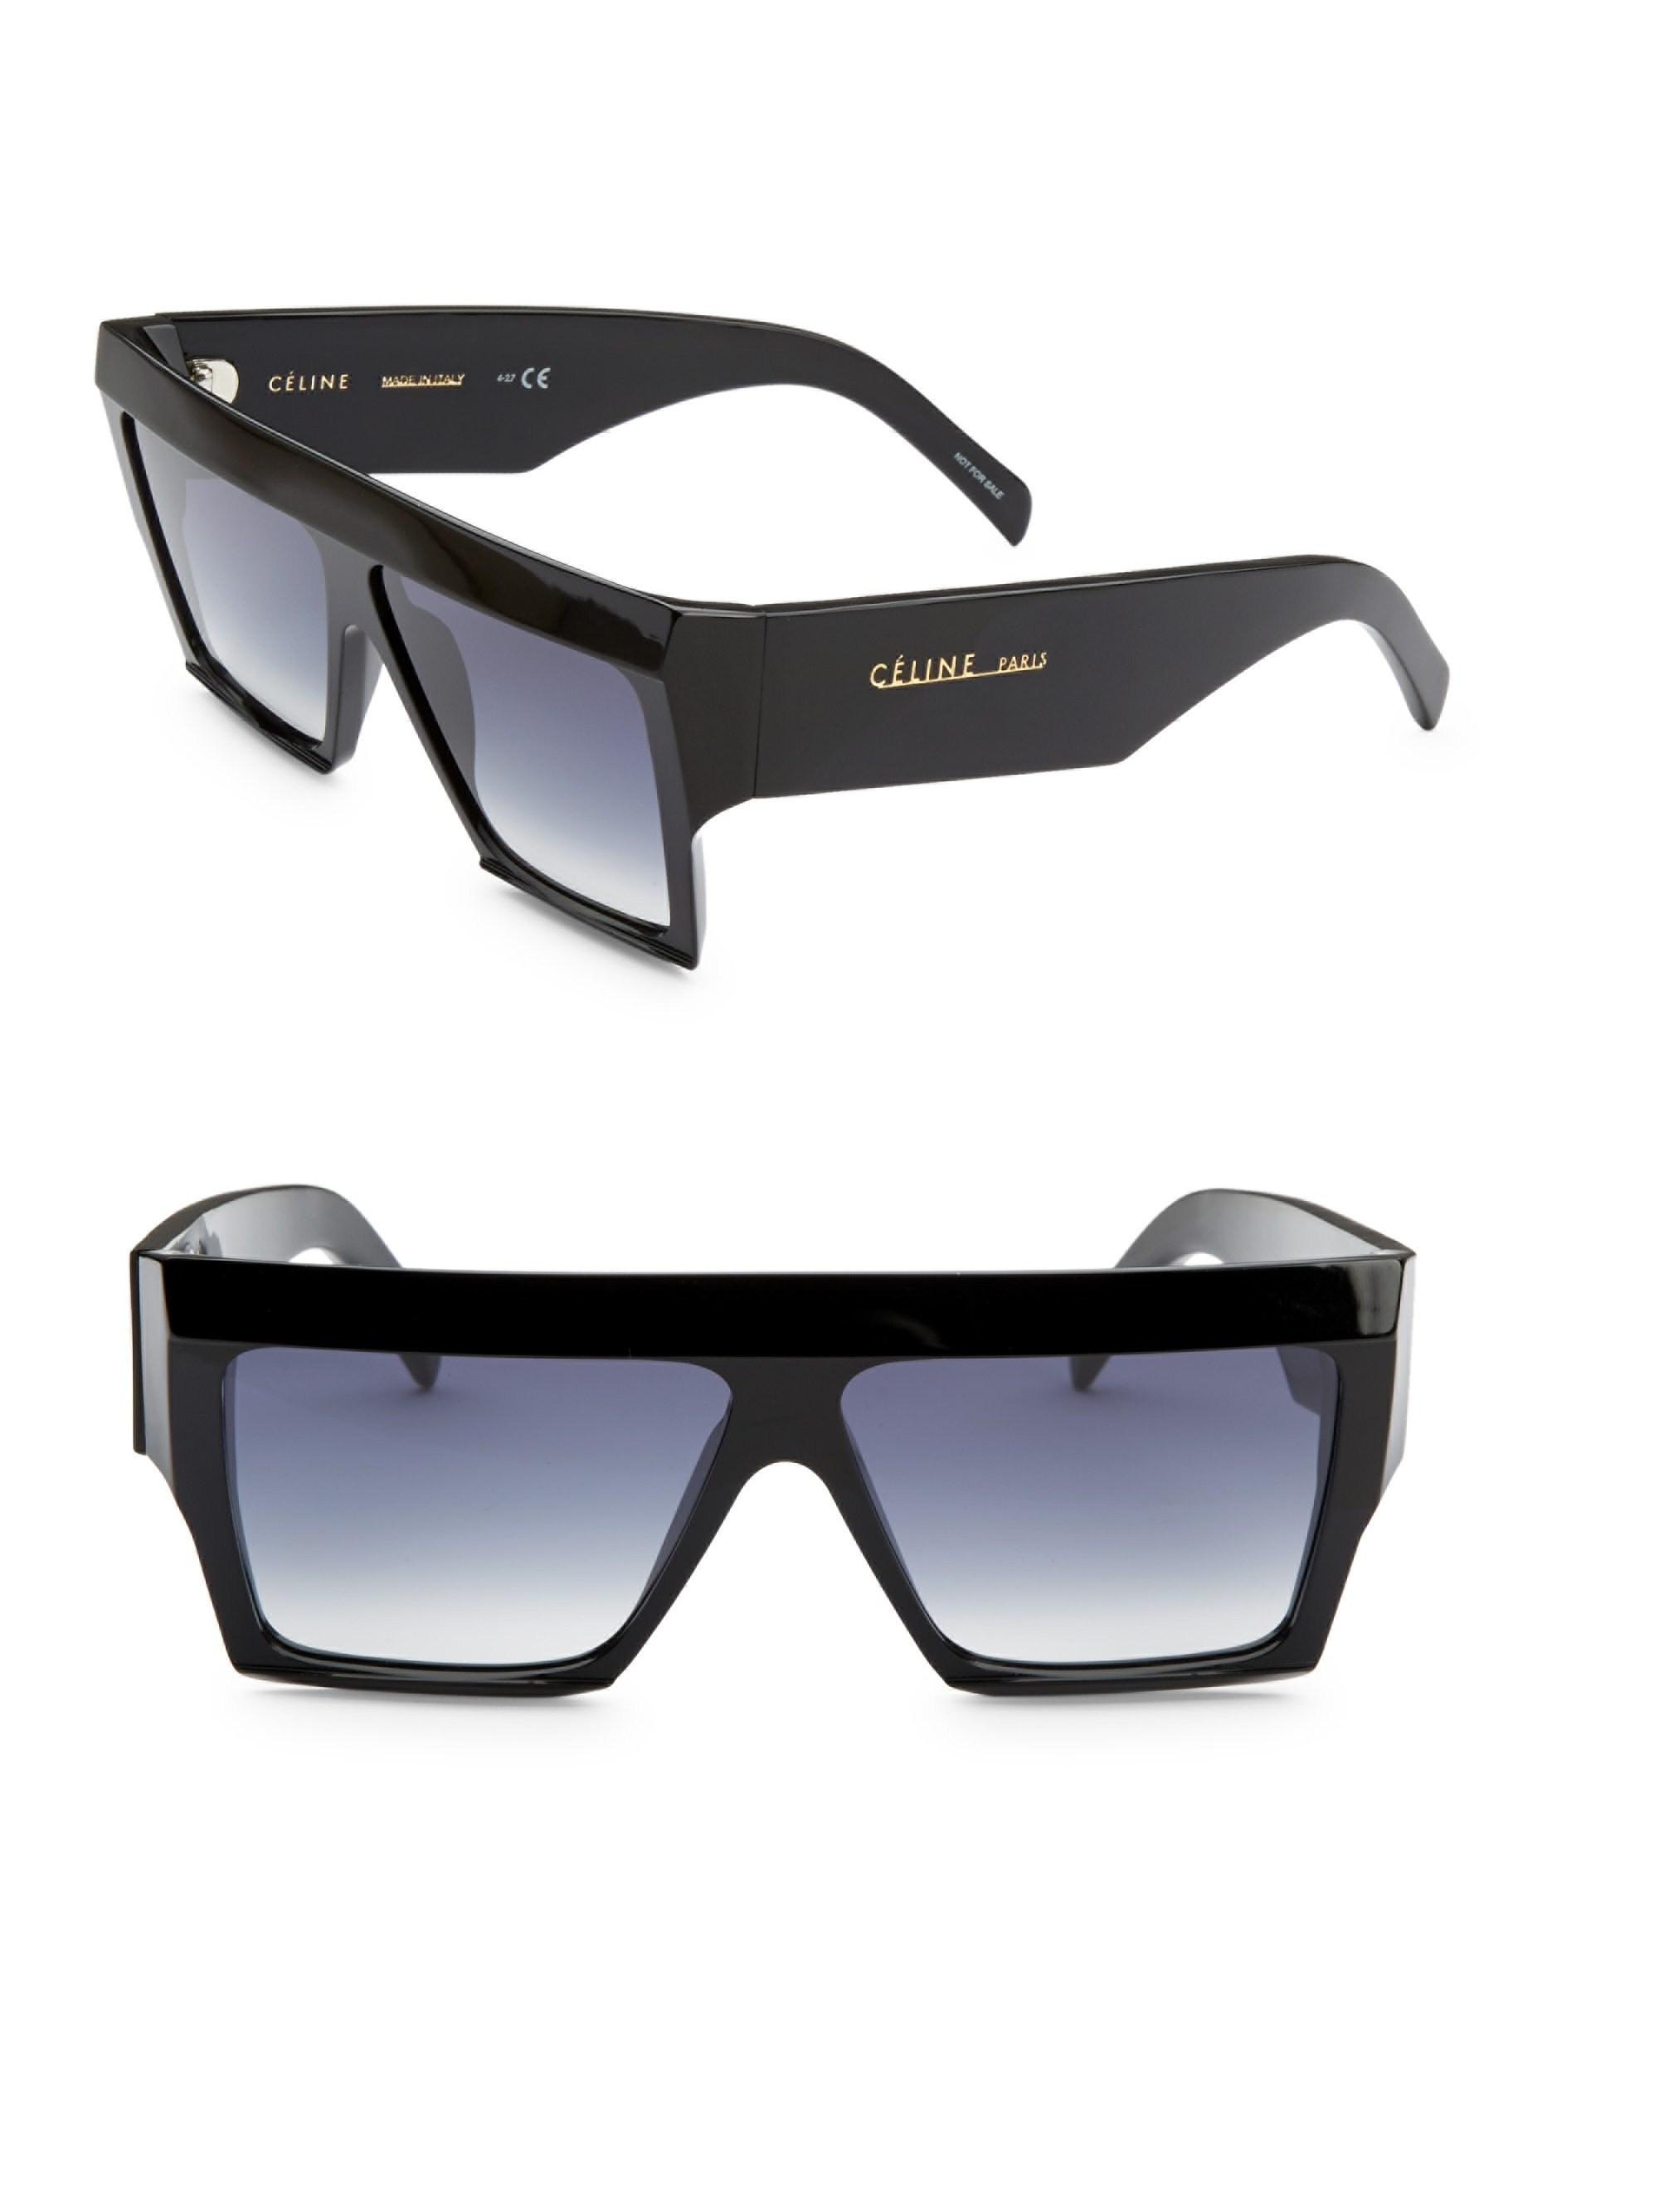 5fb0e415f0cd Lyst - Céline 61mm Wraparound Acetate Sunglasses in Black